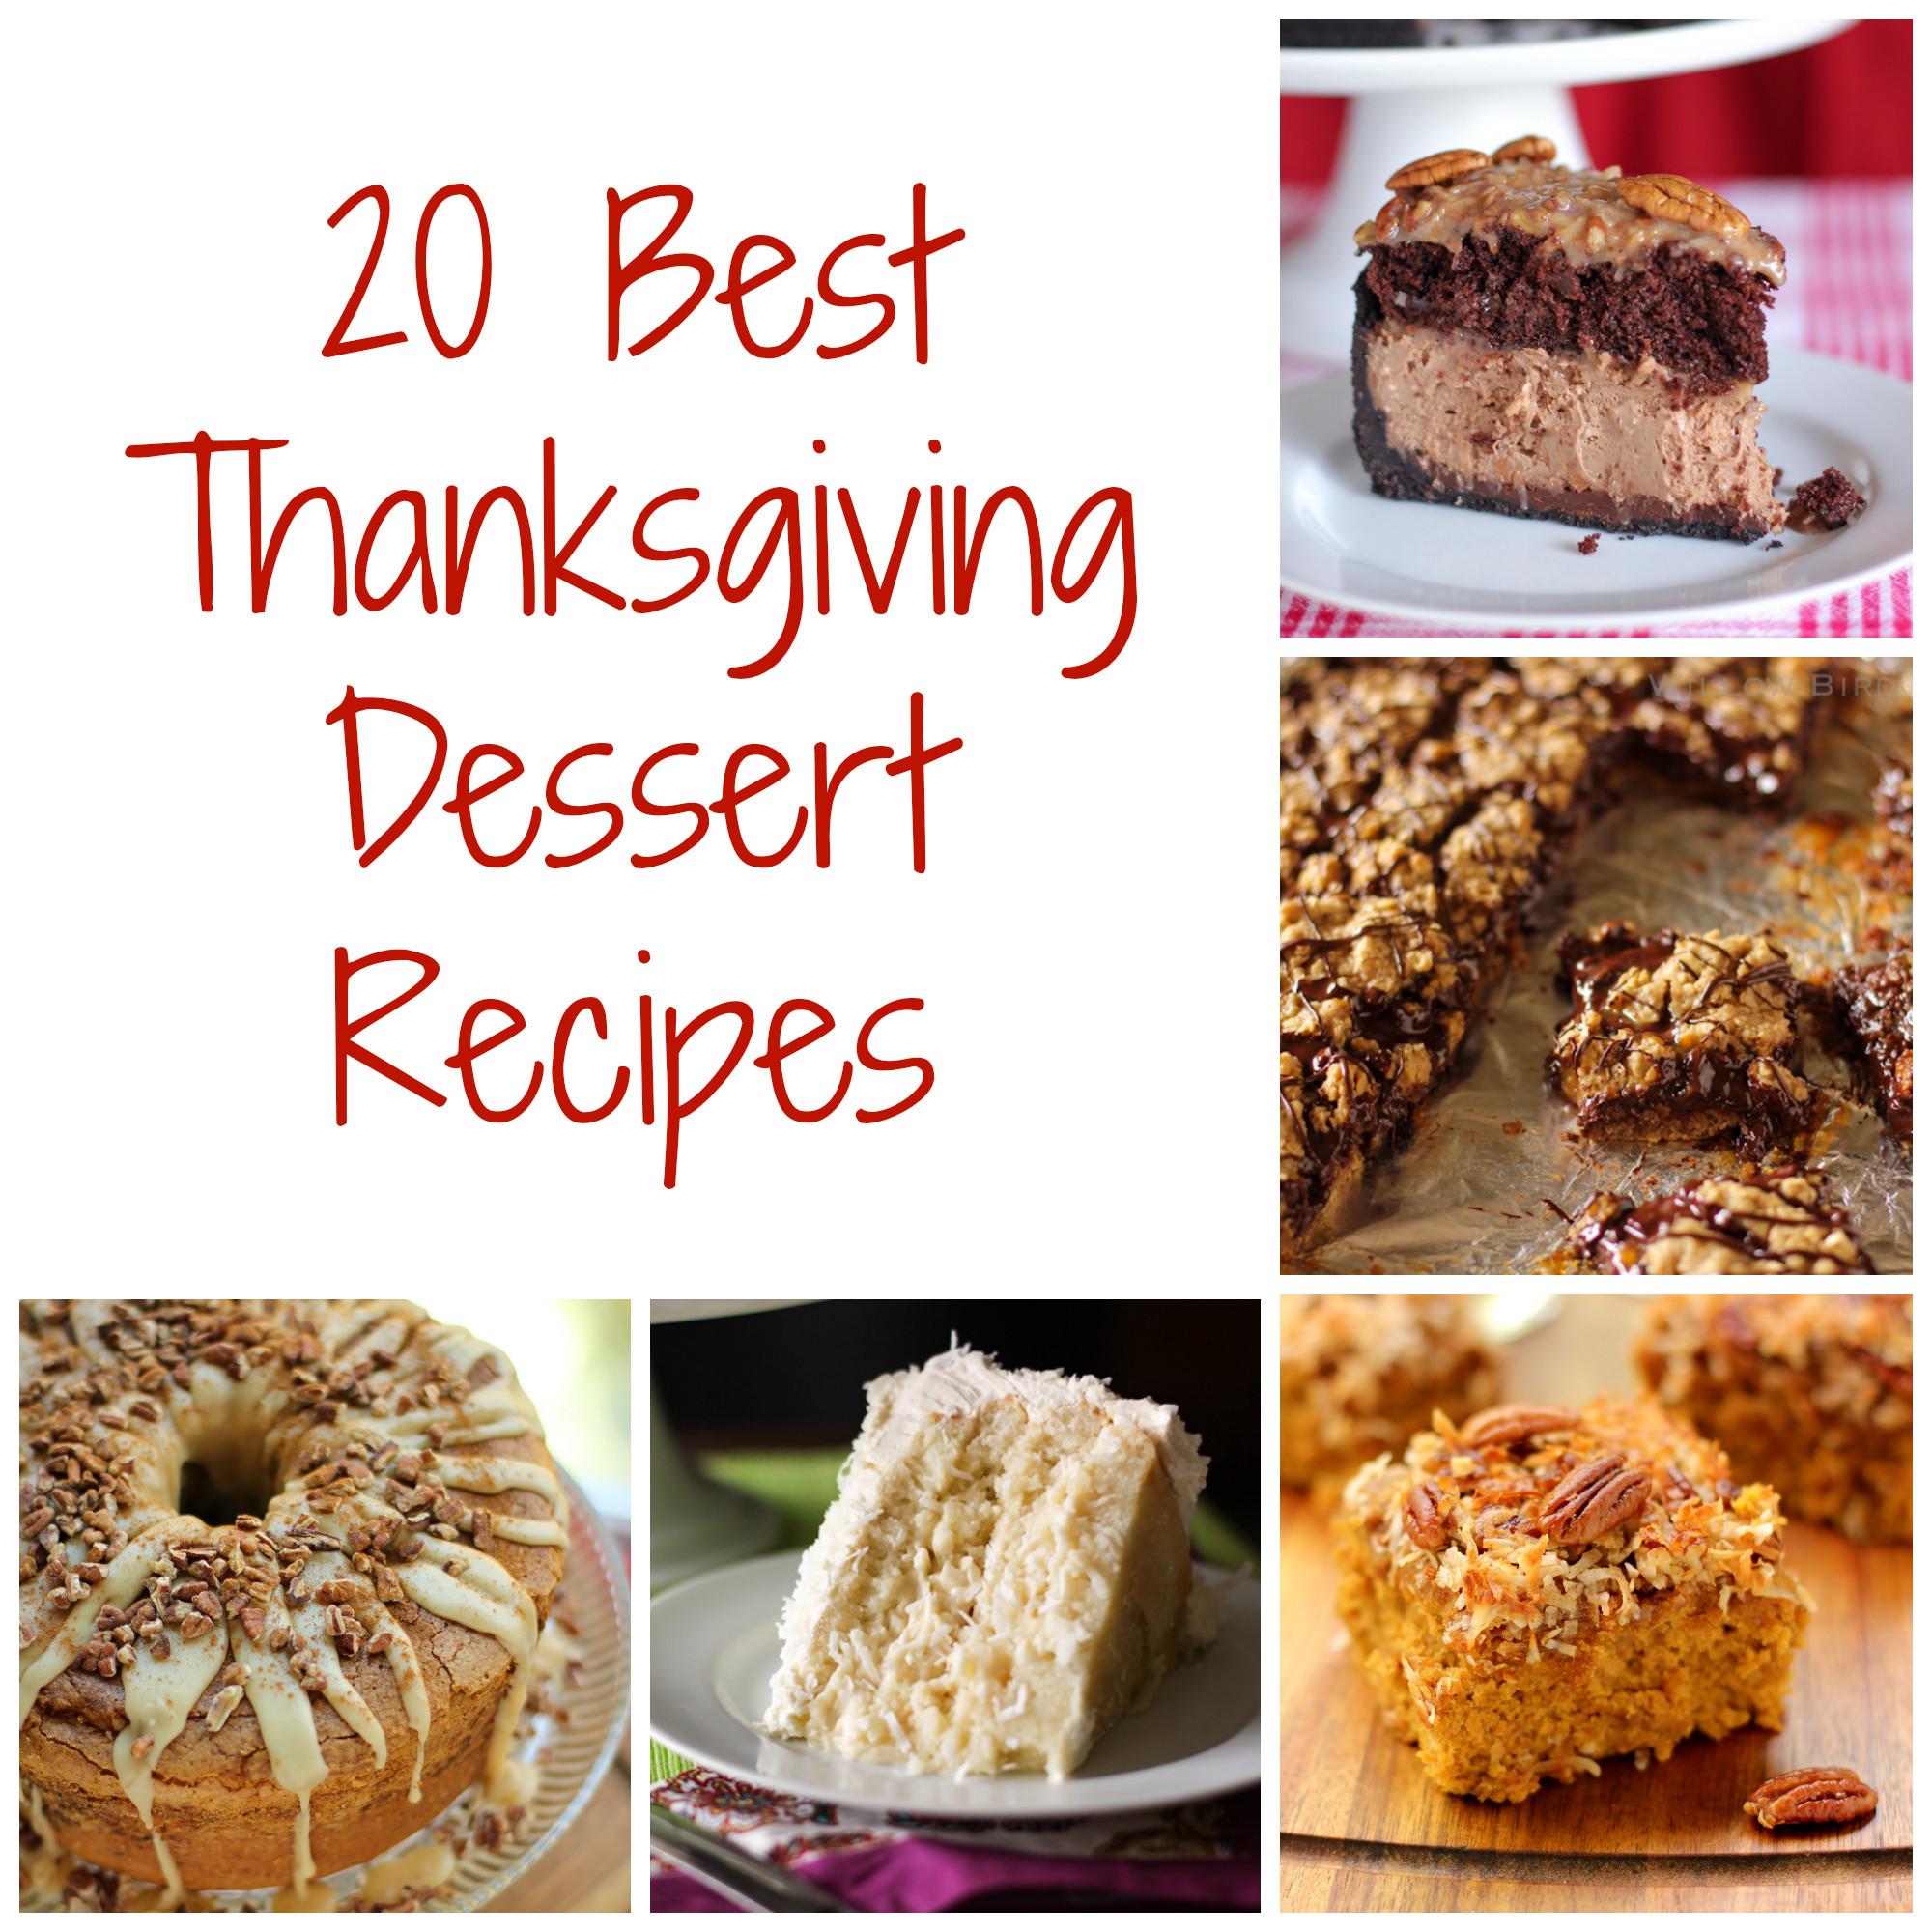 The Best Thanksgiving Desserts  Thanksgiving Dessert Recipes Willow Bird Baking